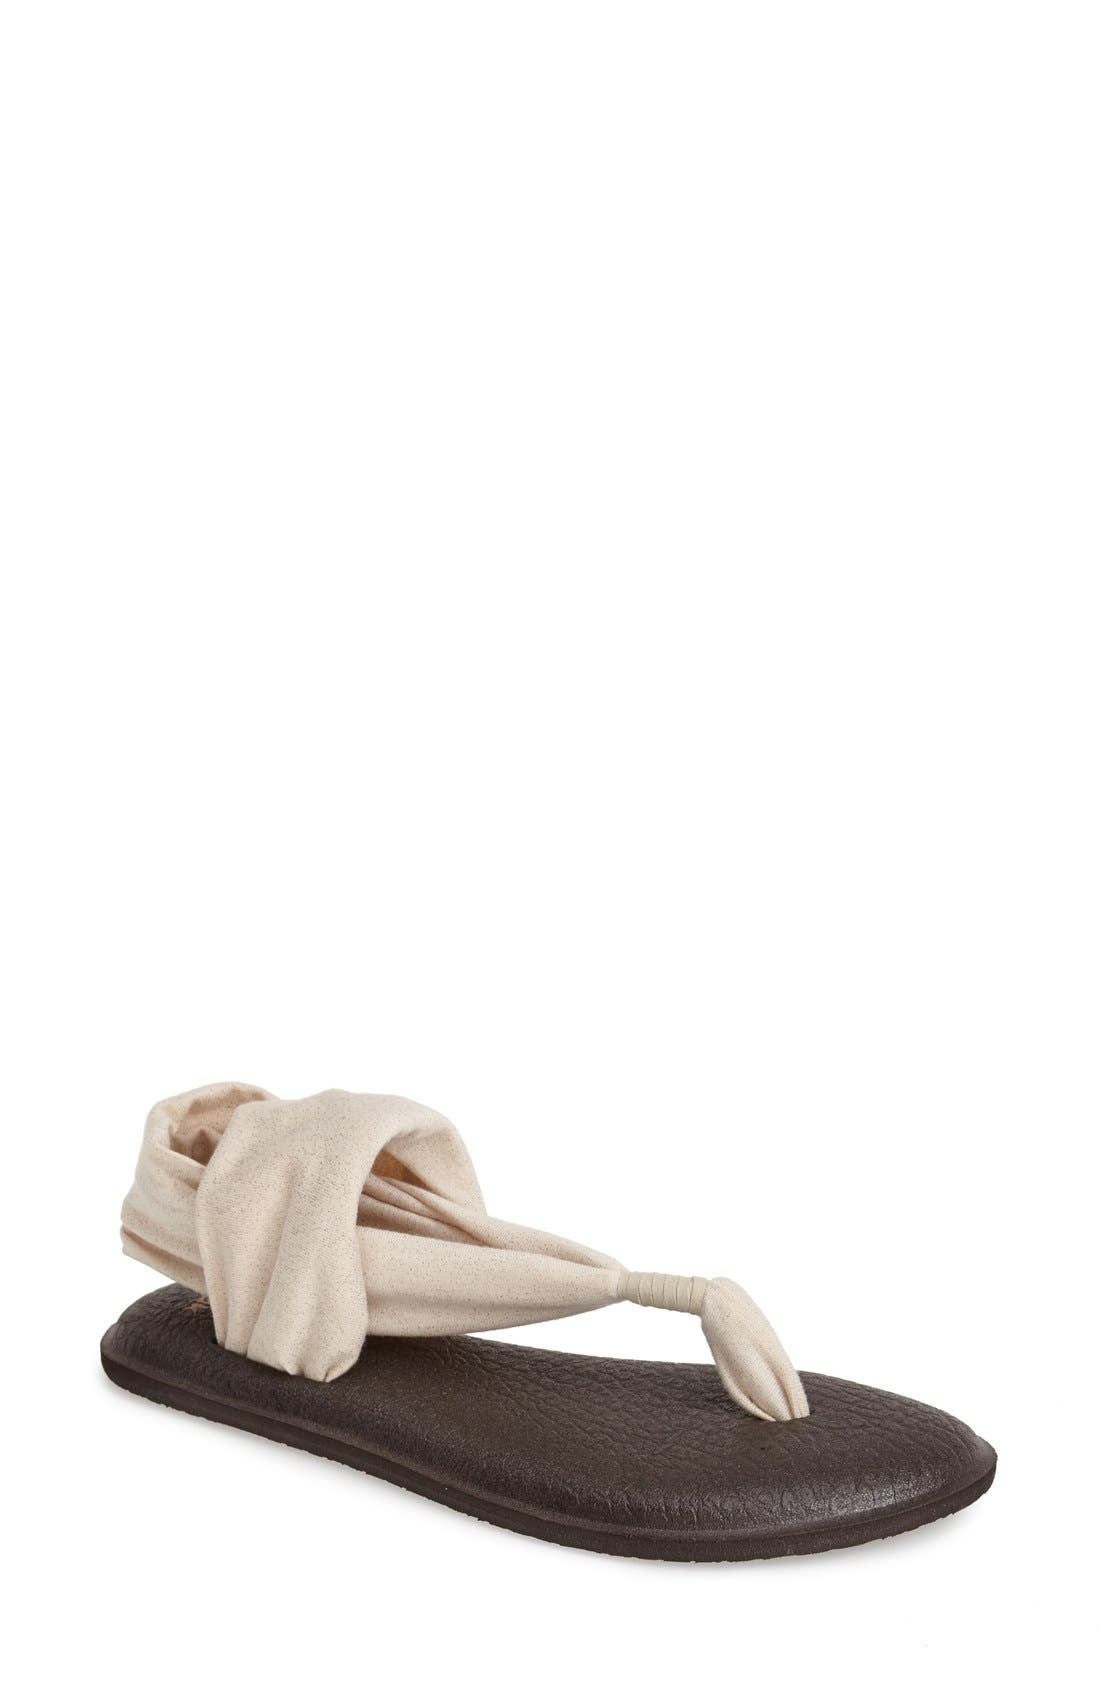 SANUK 'Yoga Metallic Sling' Sandal